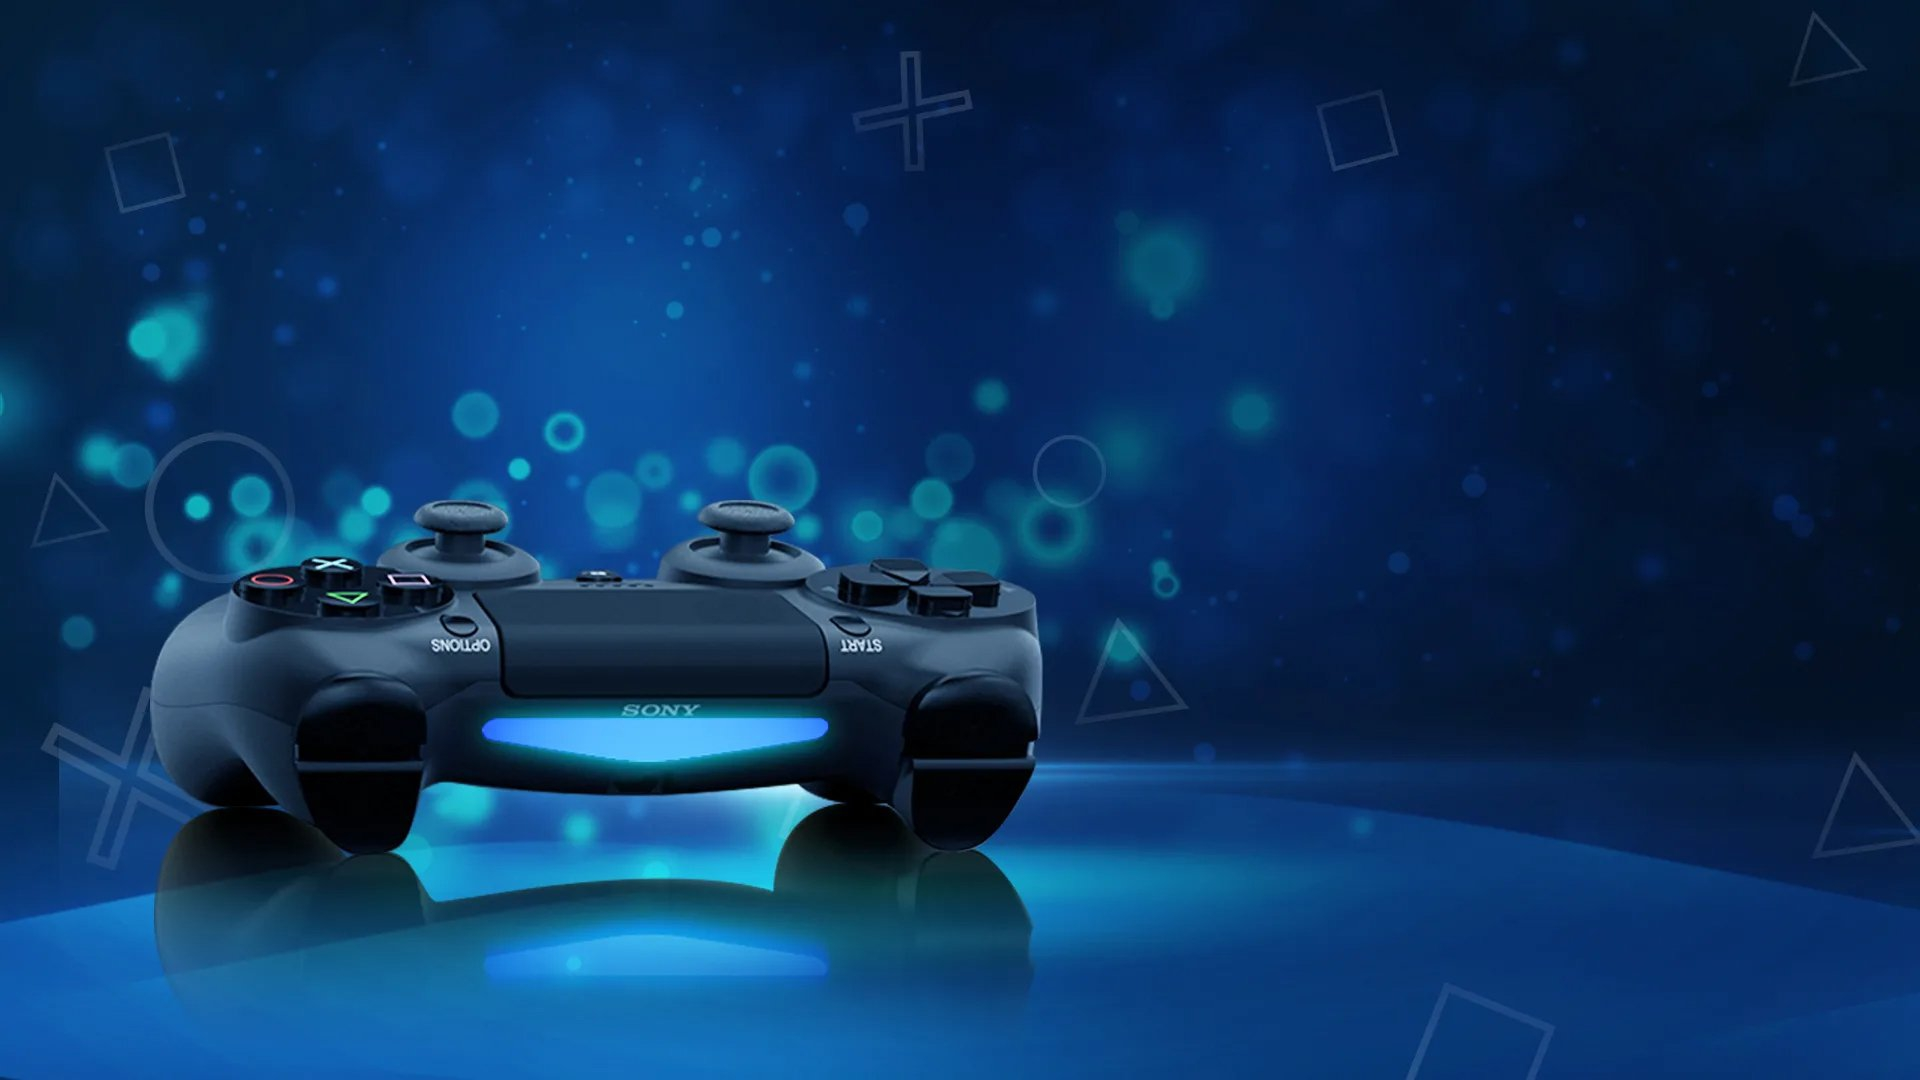 PS5 supporta il multiplayer cross-gen